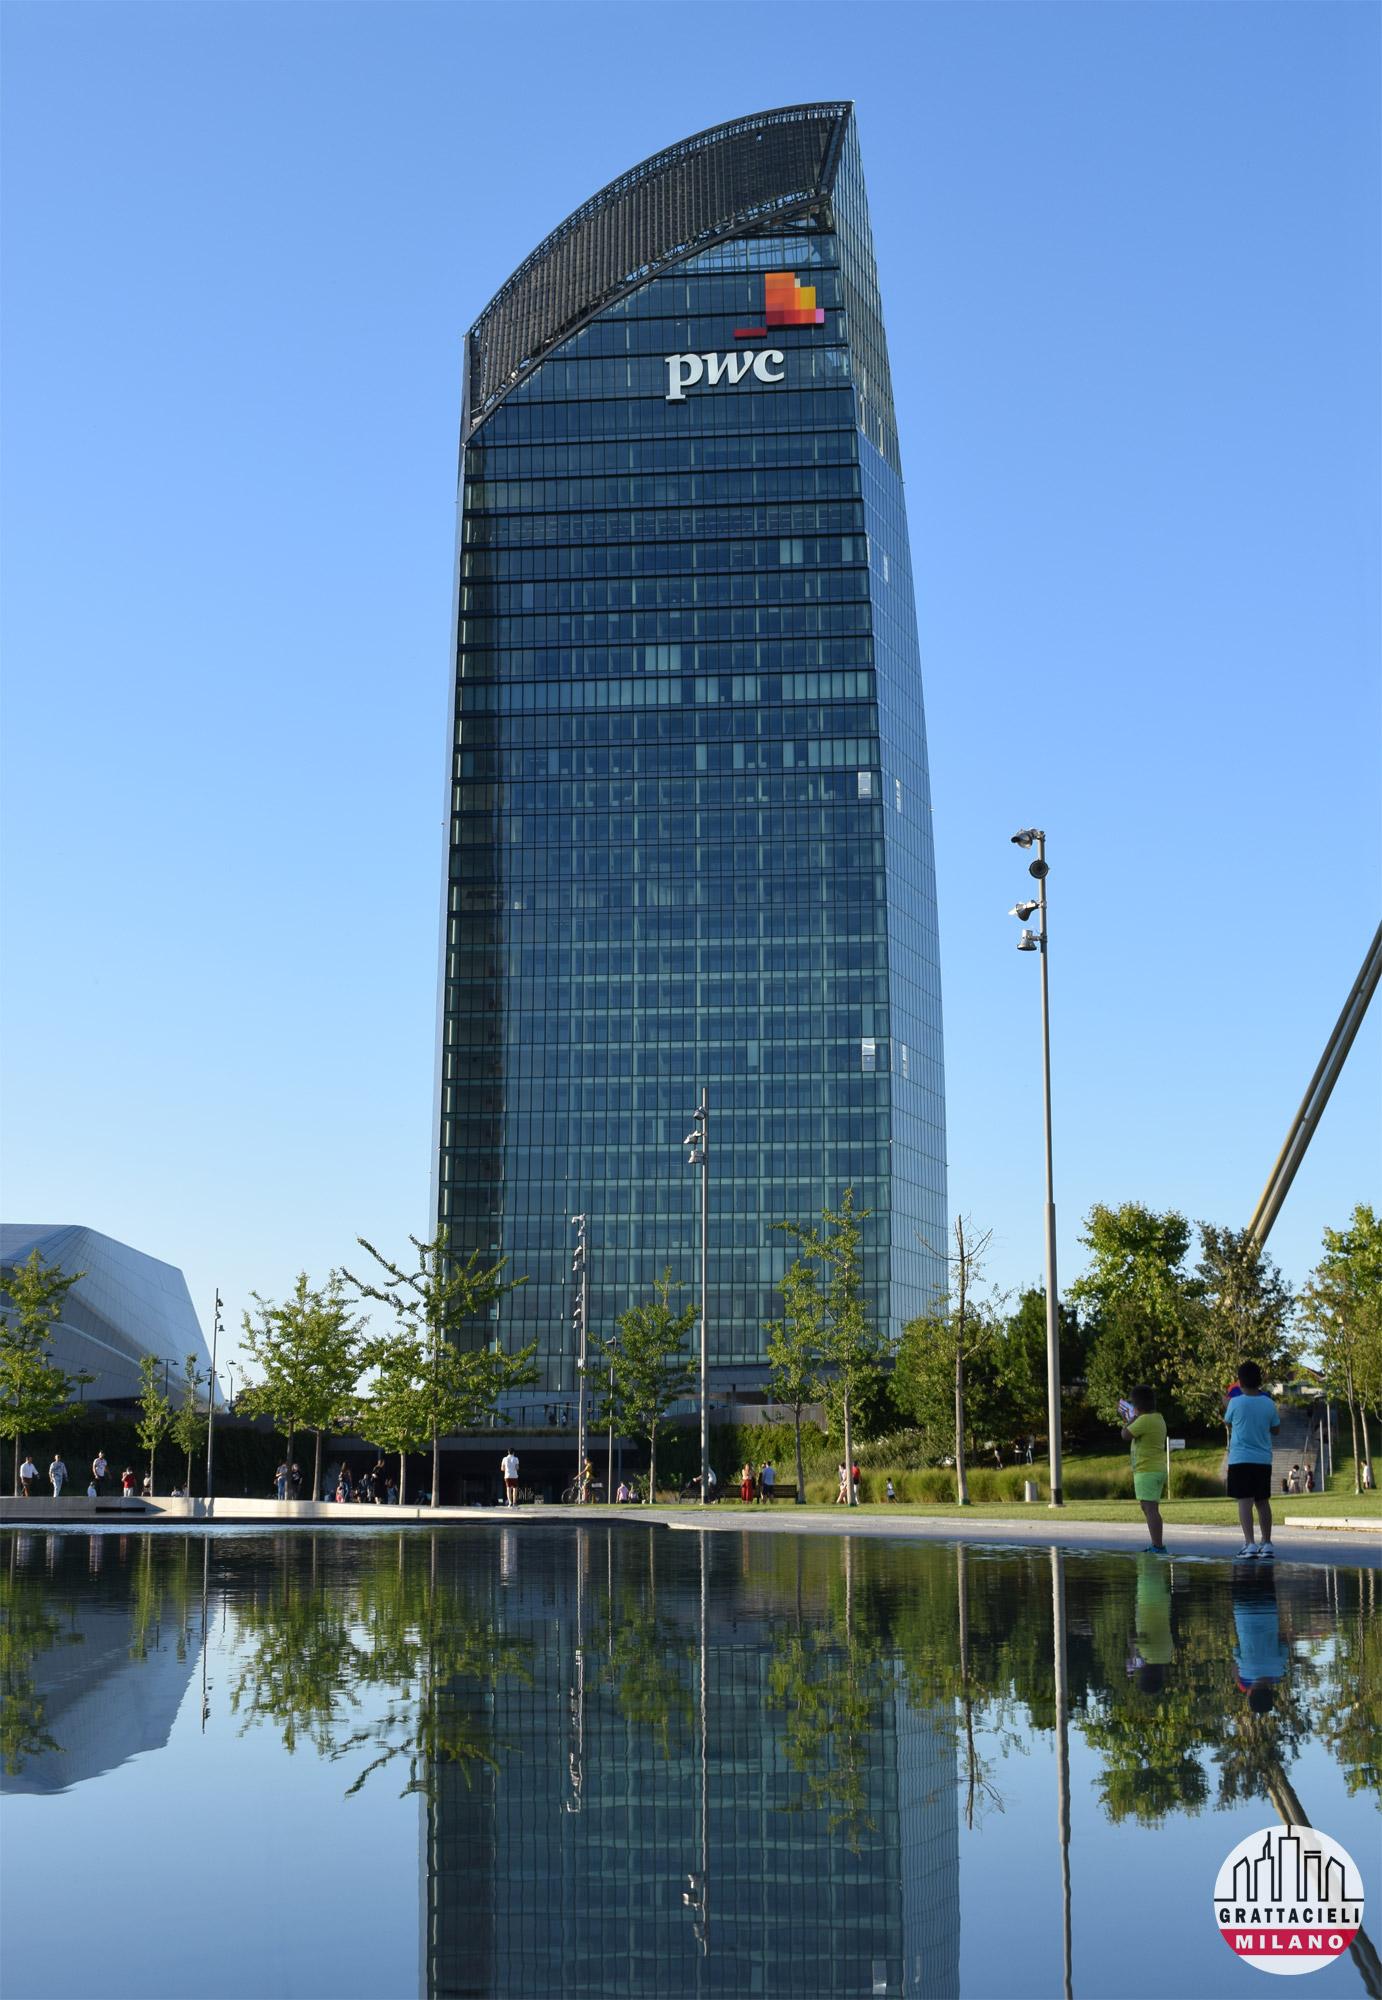 PwC Tower (Libeskind). Photo ©2020 Demetrio Rizzo